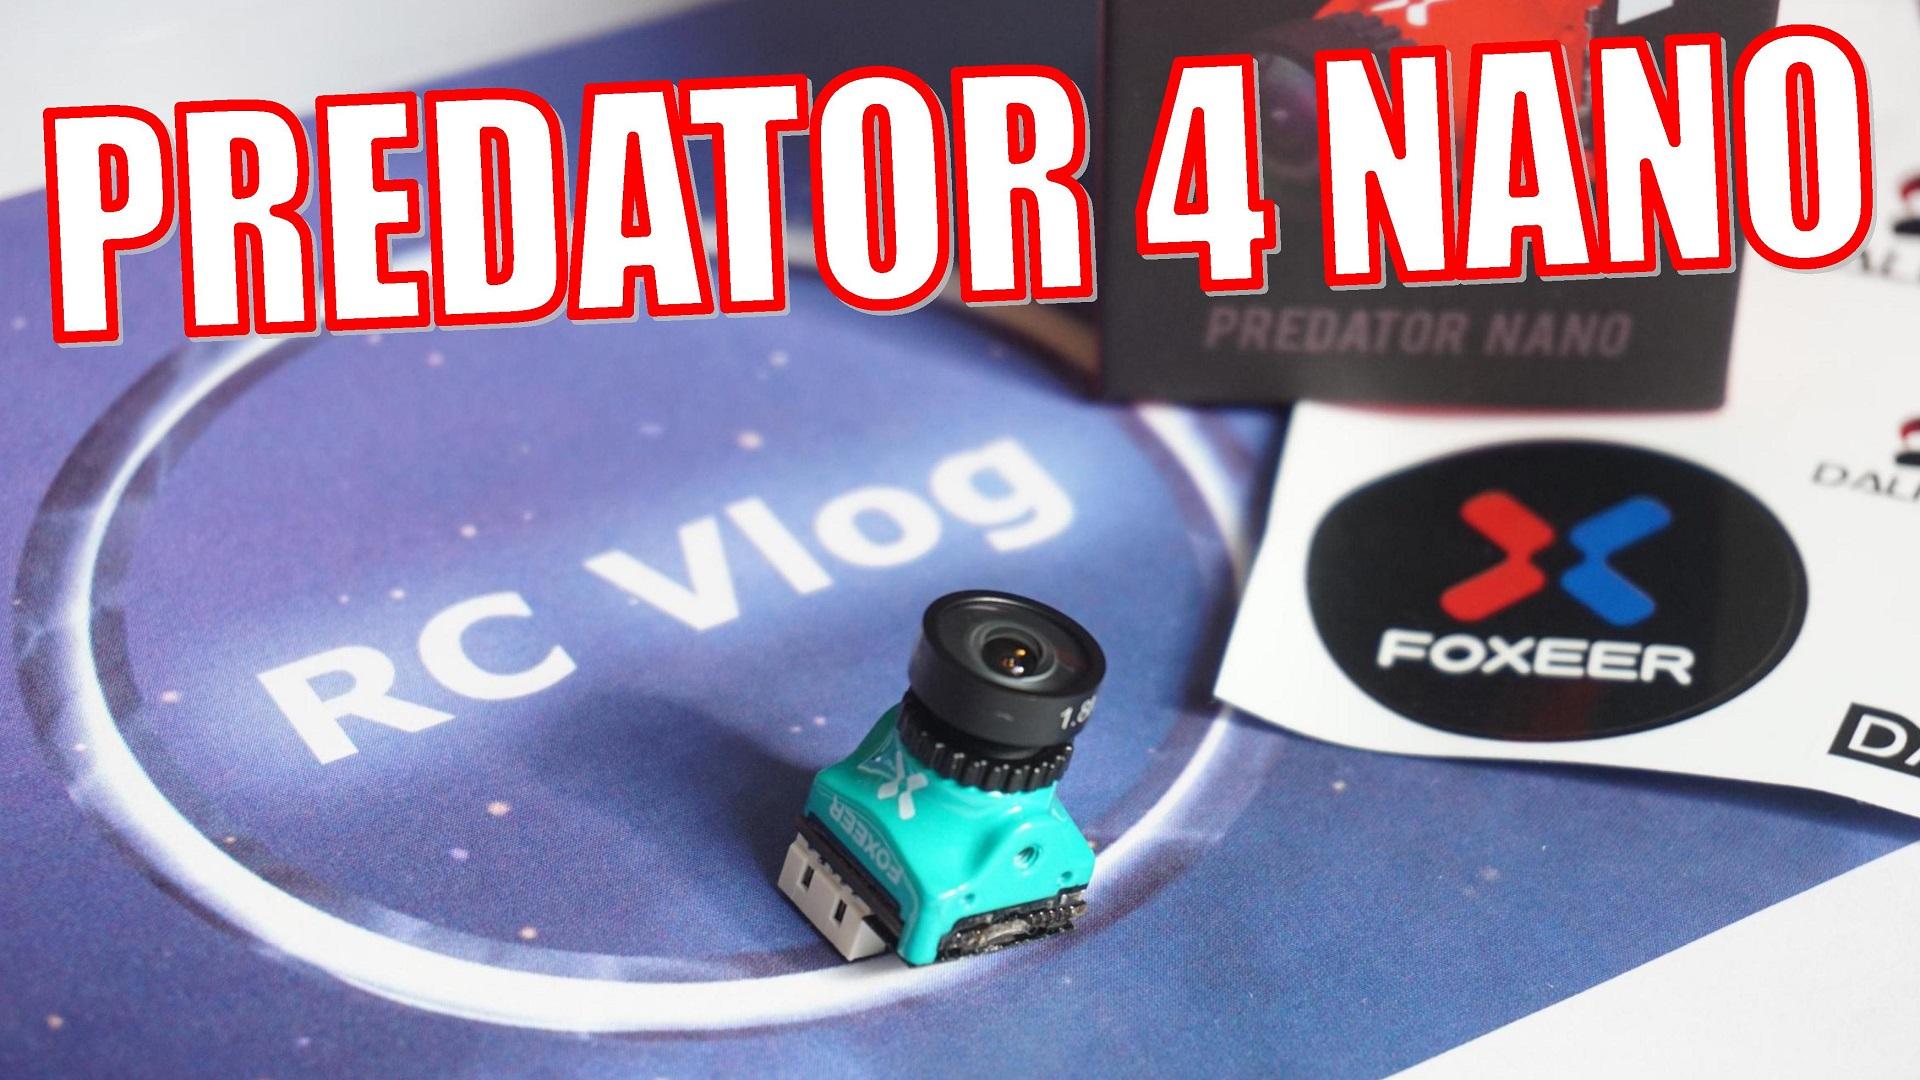 Foxeer Predator 4 Nano